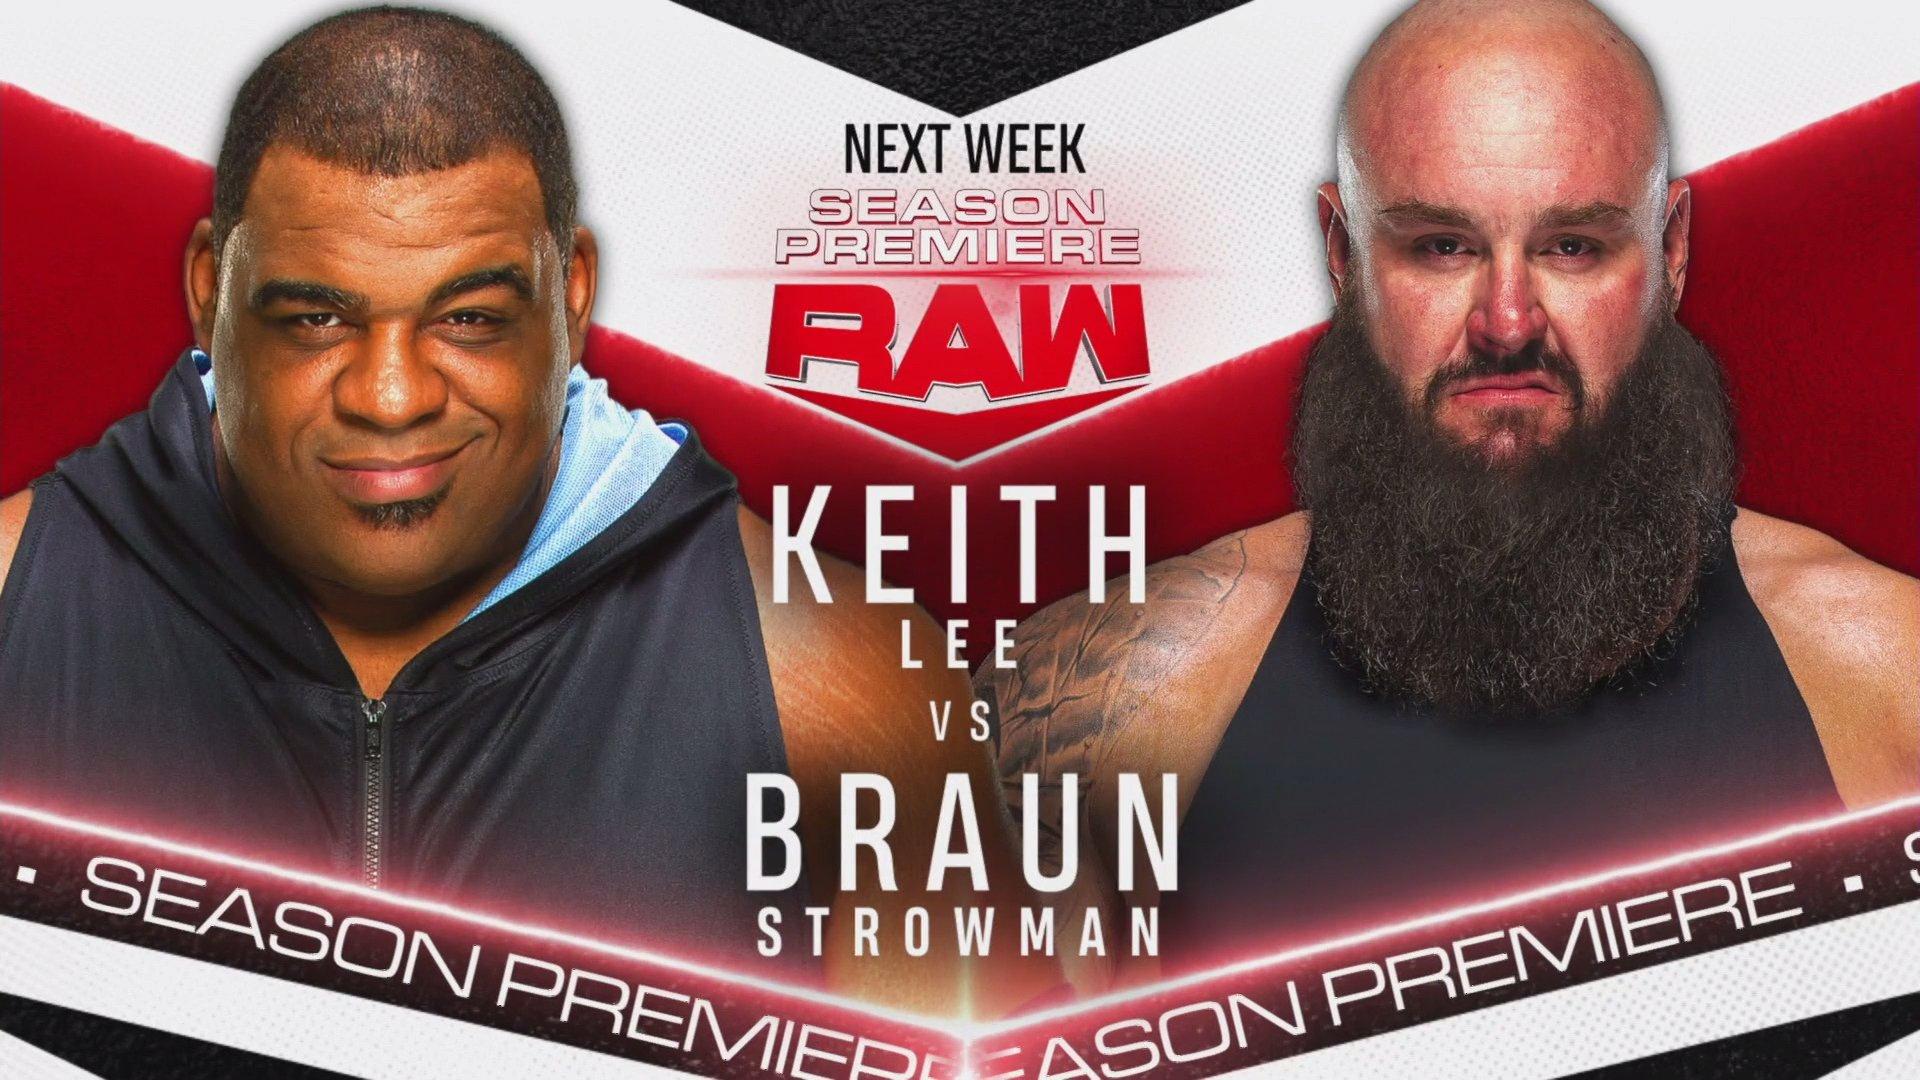 WWE Raw Season Premiere: Title Match, Strowman vs Lee & More Announced 2